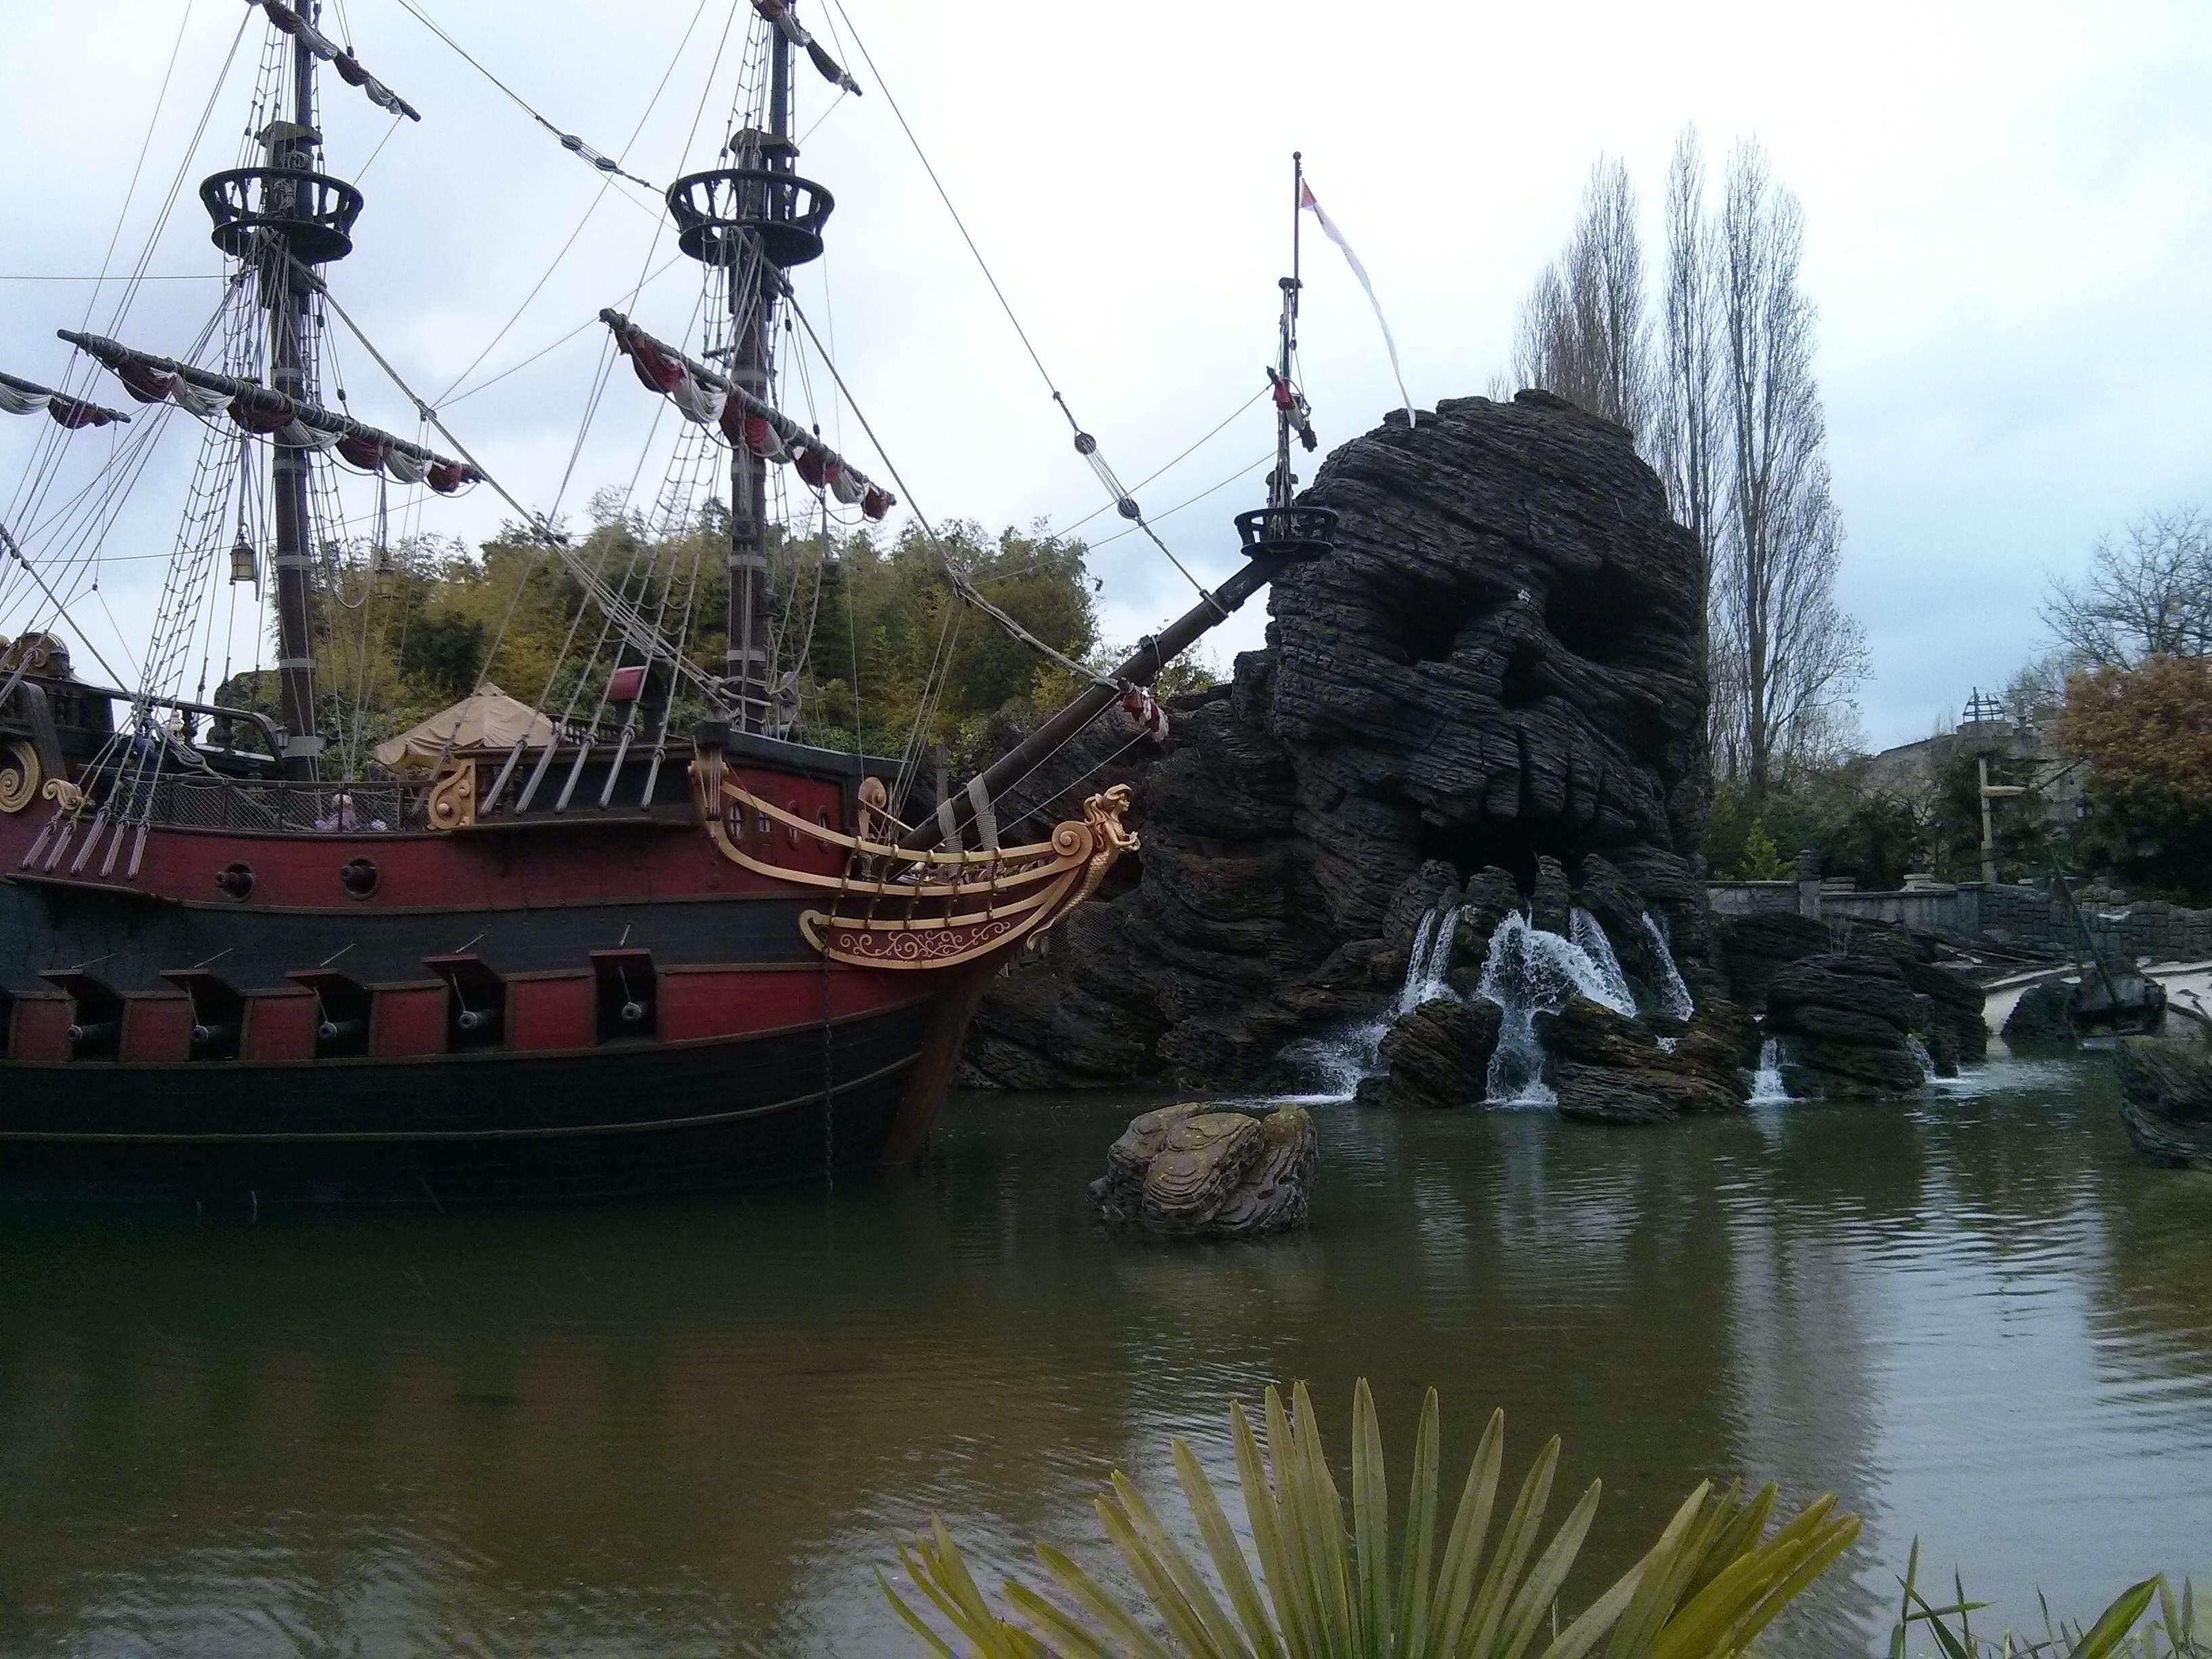 Le bateau pirate d'Adventureland